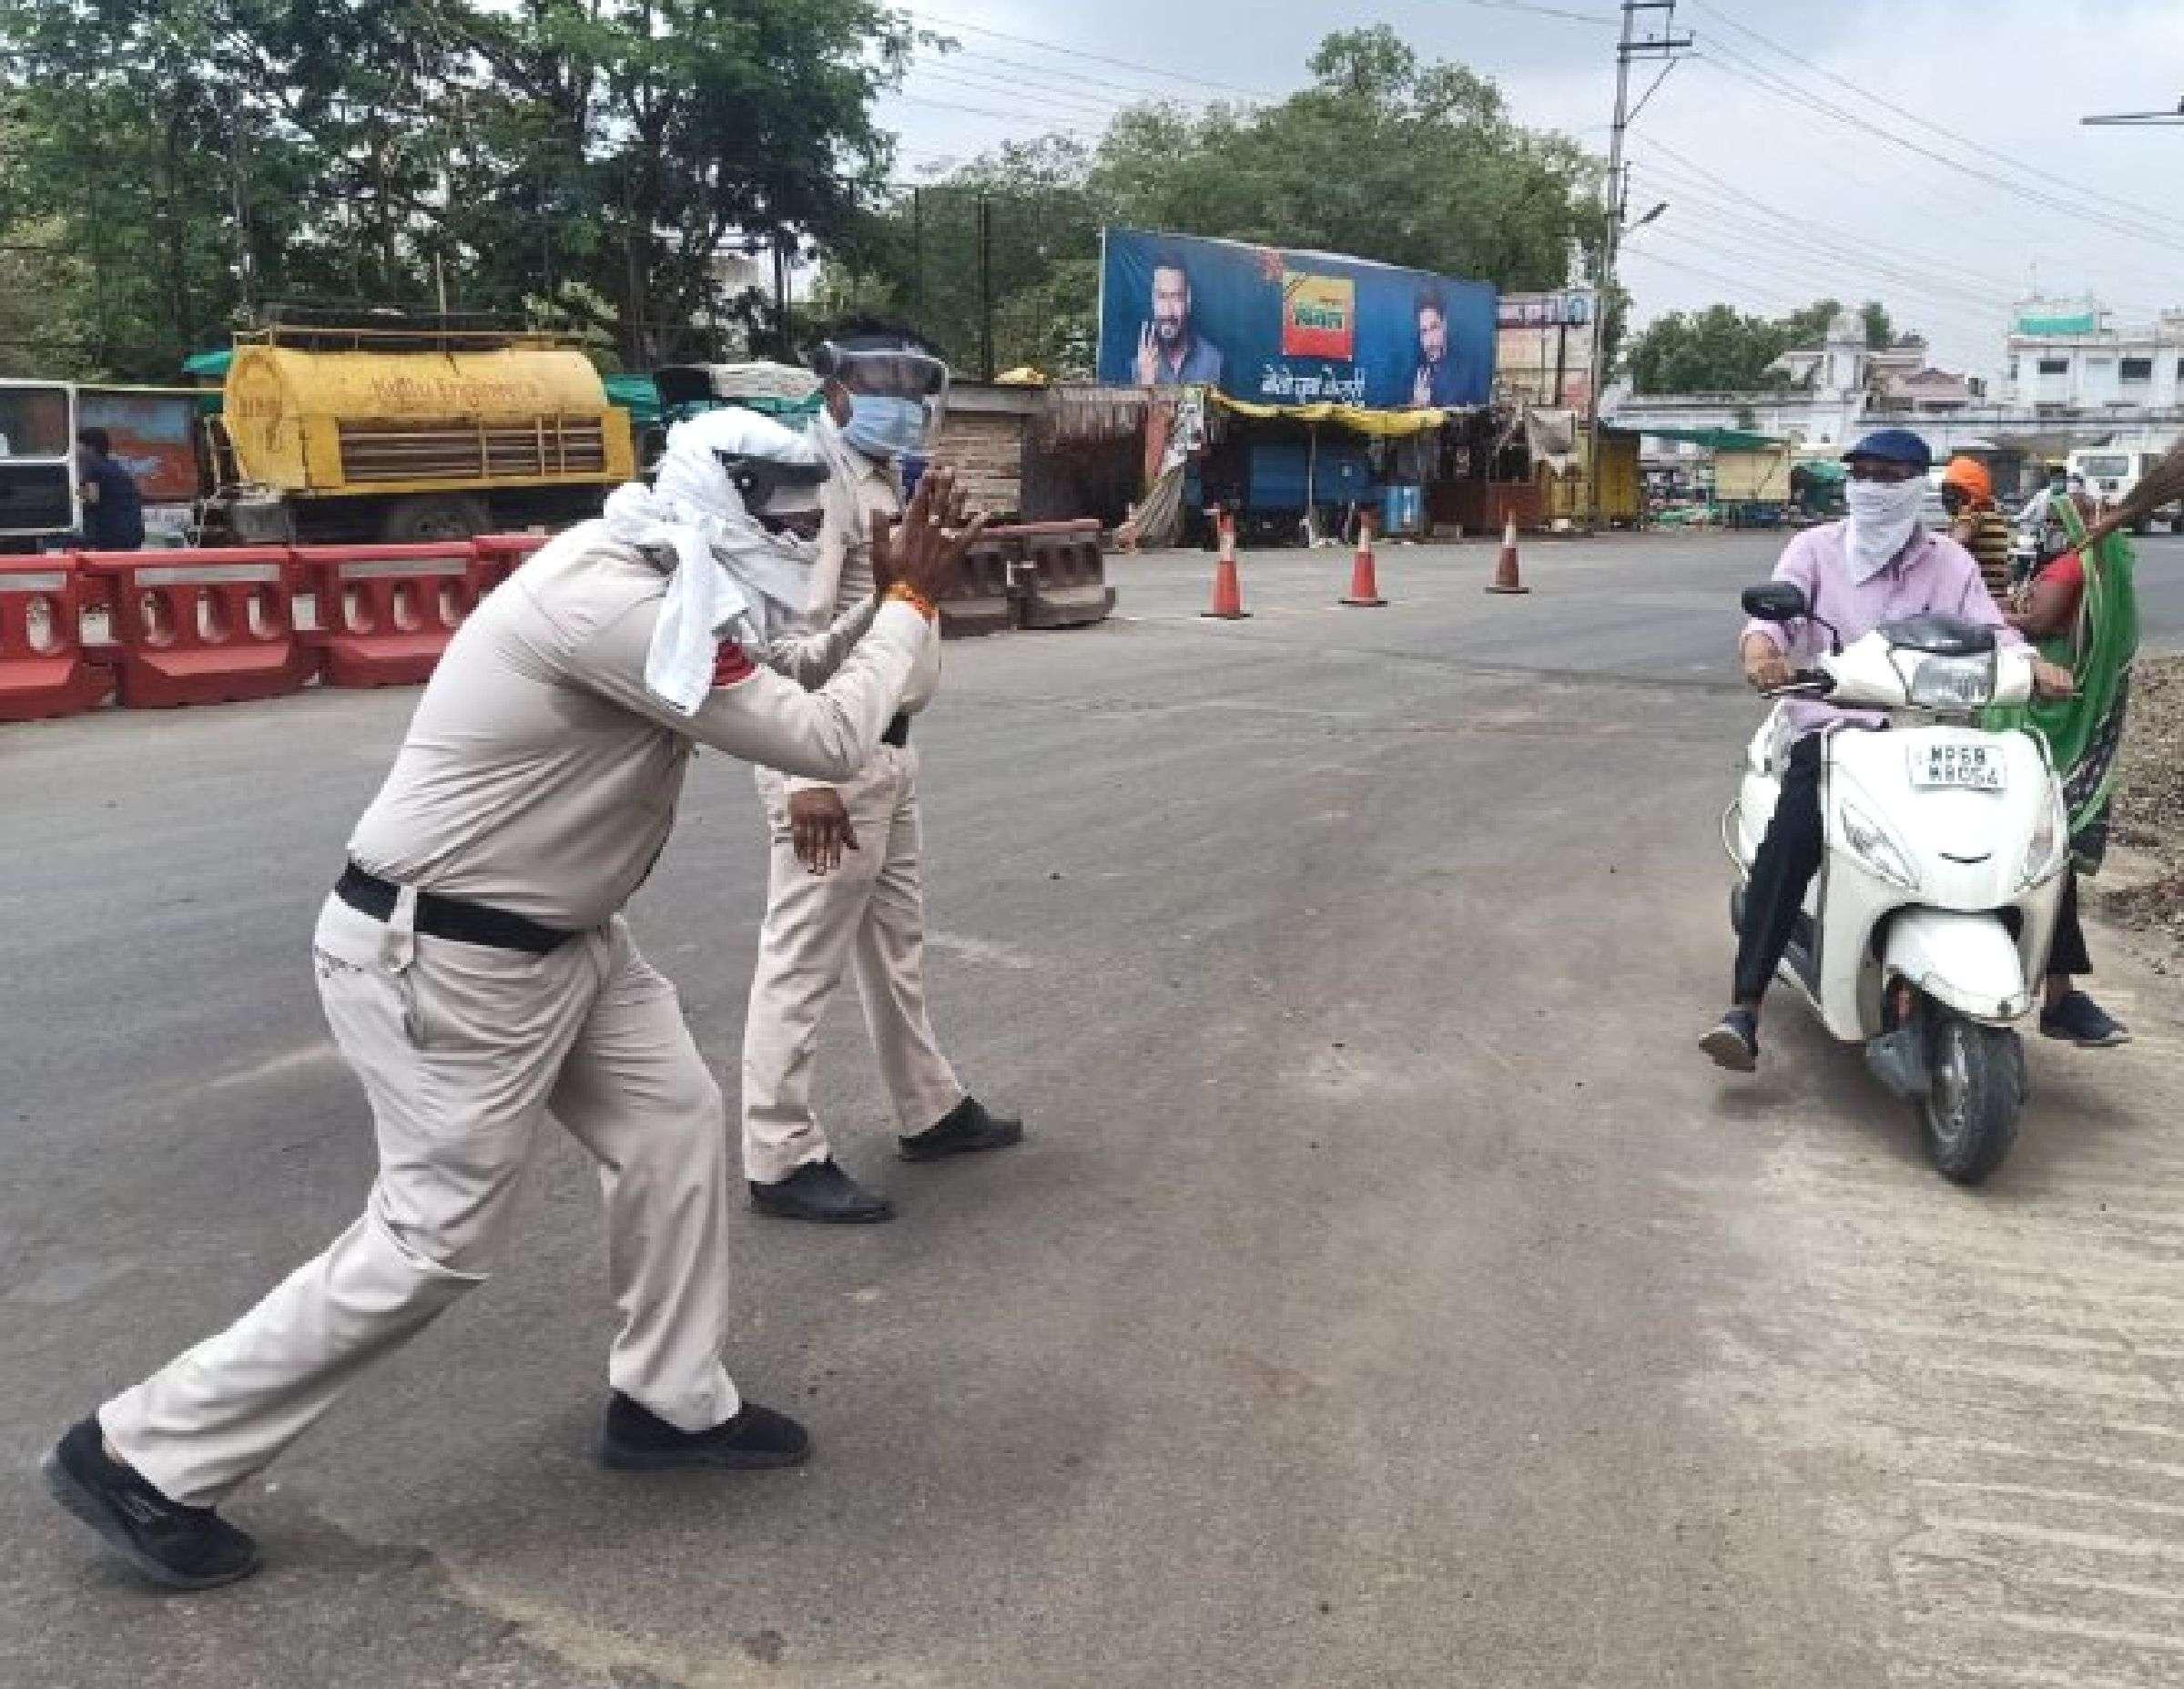 Police saw Gandhigiri, folded hands and said stay inside